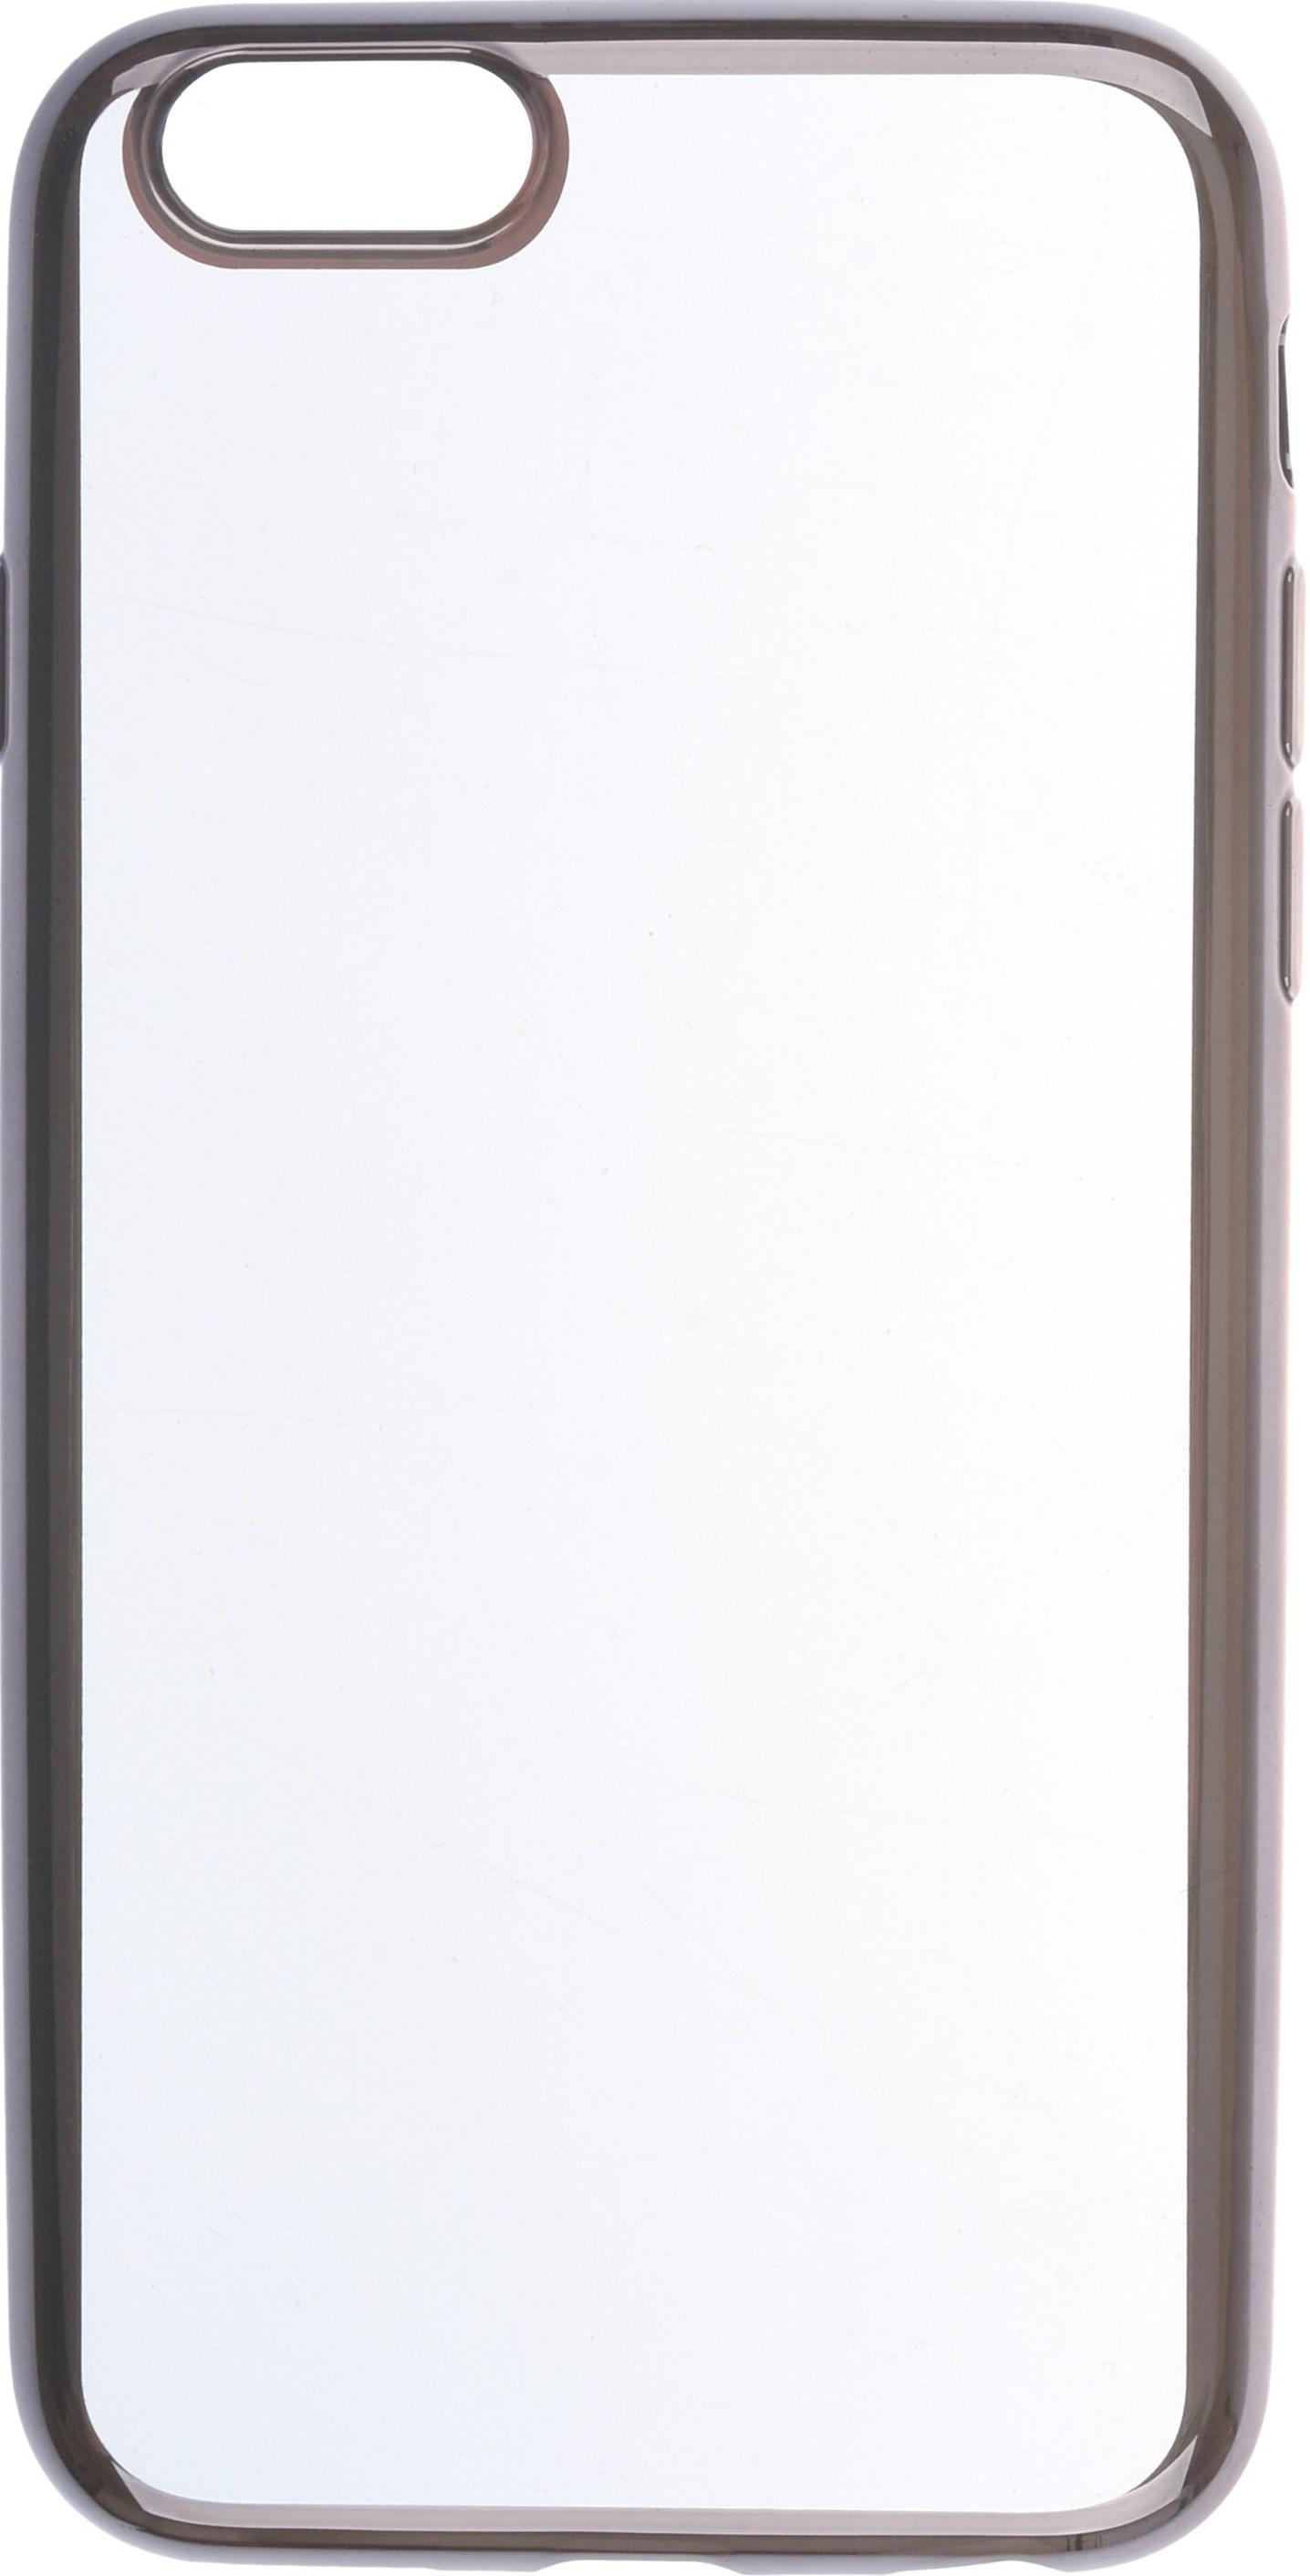 все цены на Чехол для сотового телефона skinBOX Silicone chrome border, 4630042520875, черный онлайн